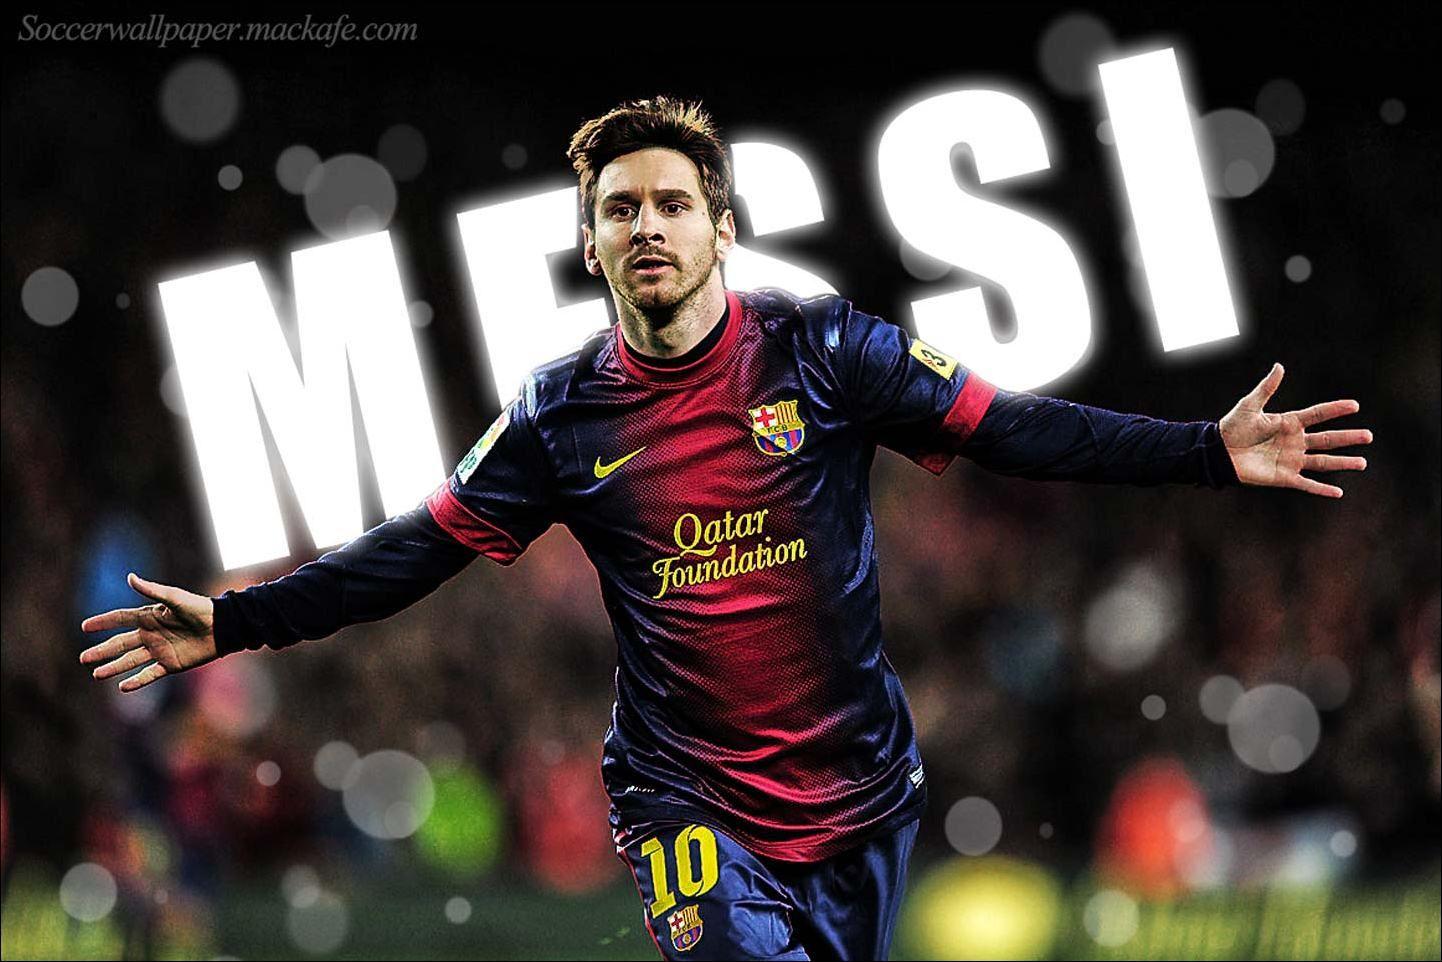 Messi Photo Wallpaper Messi Messi photos Lionel messi 1442x962